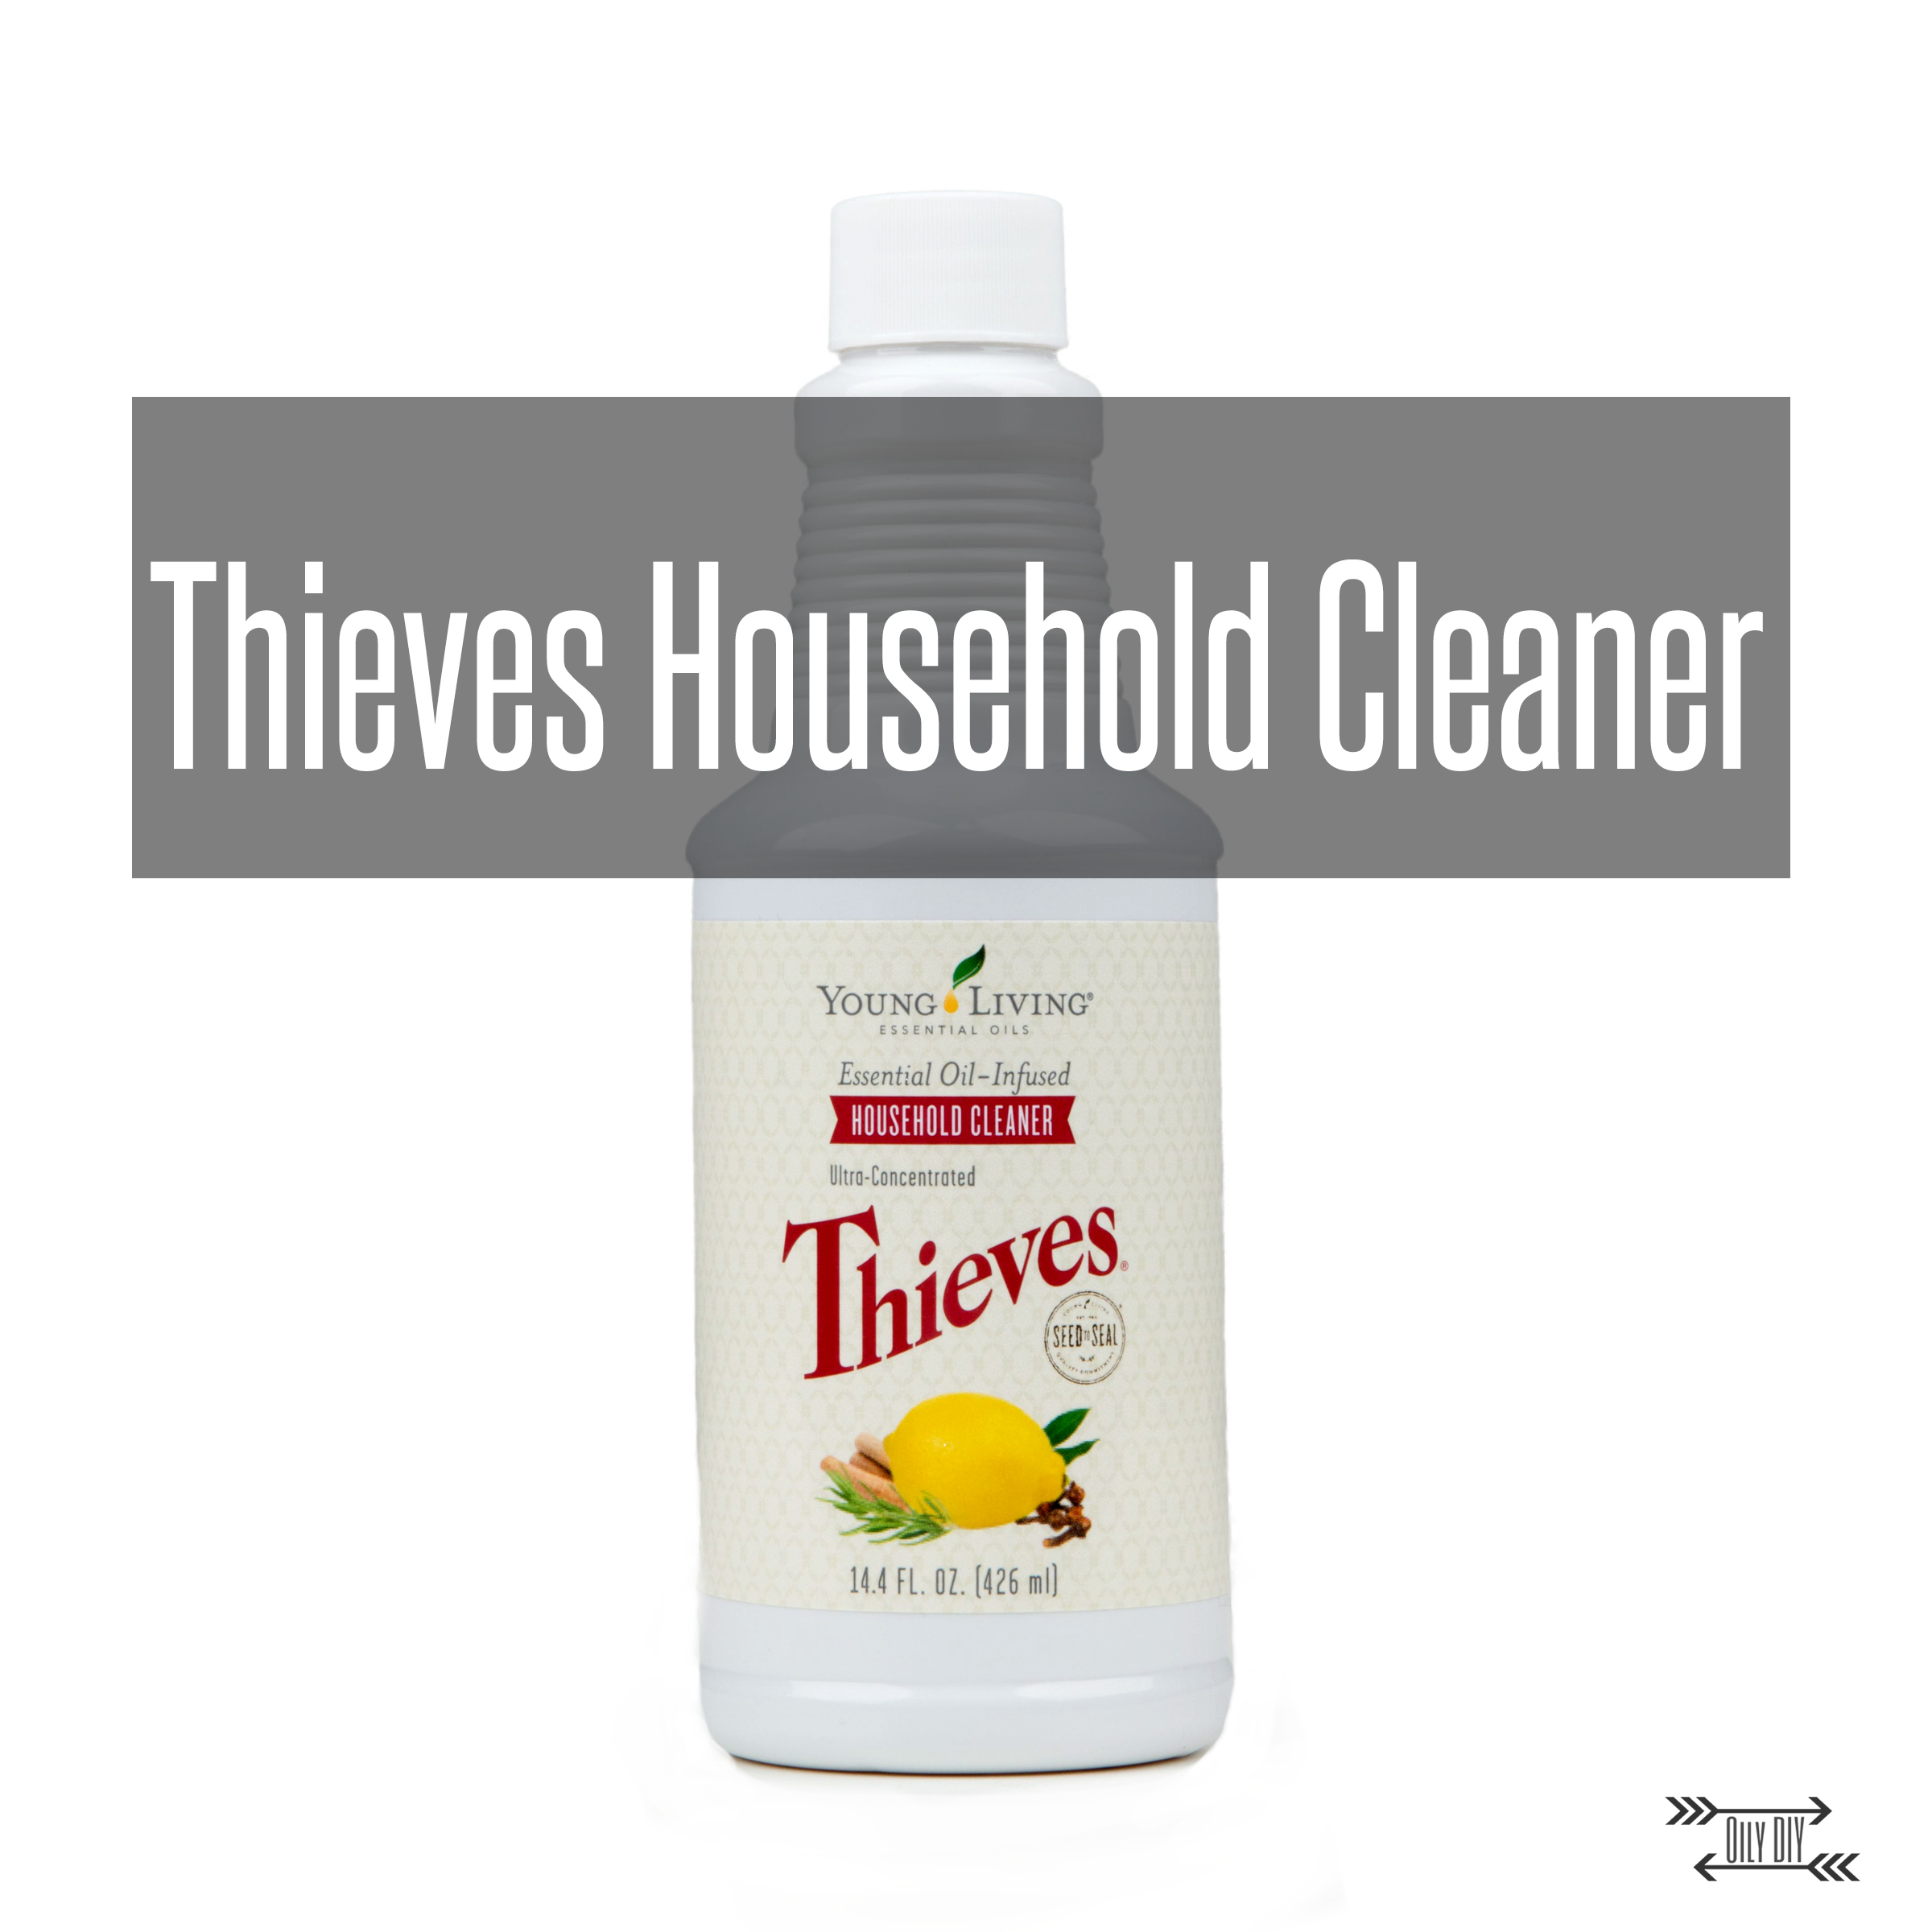 ThievesCleanerTitle.jpg